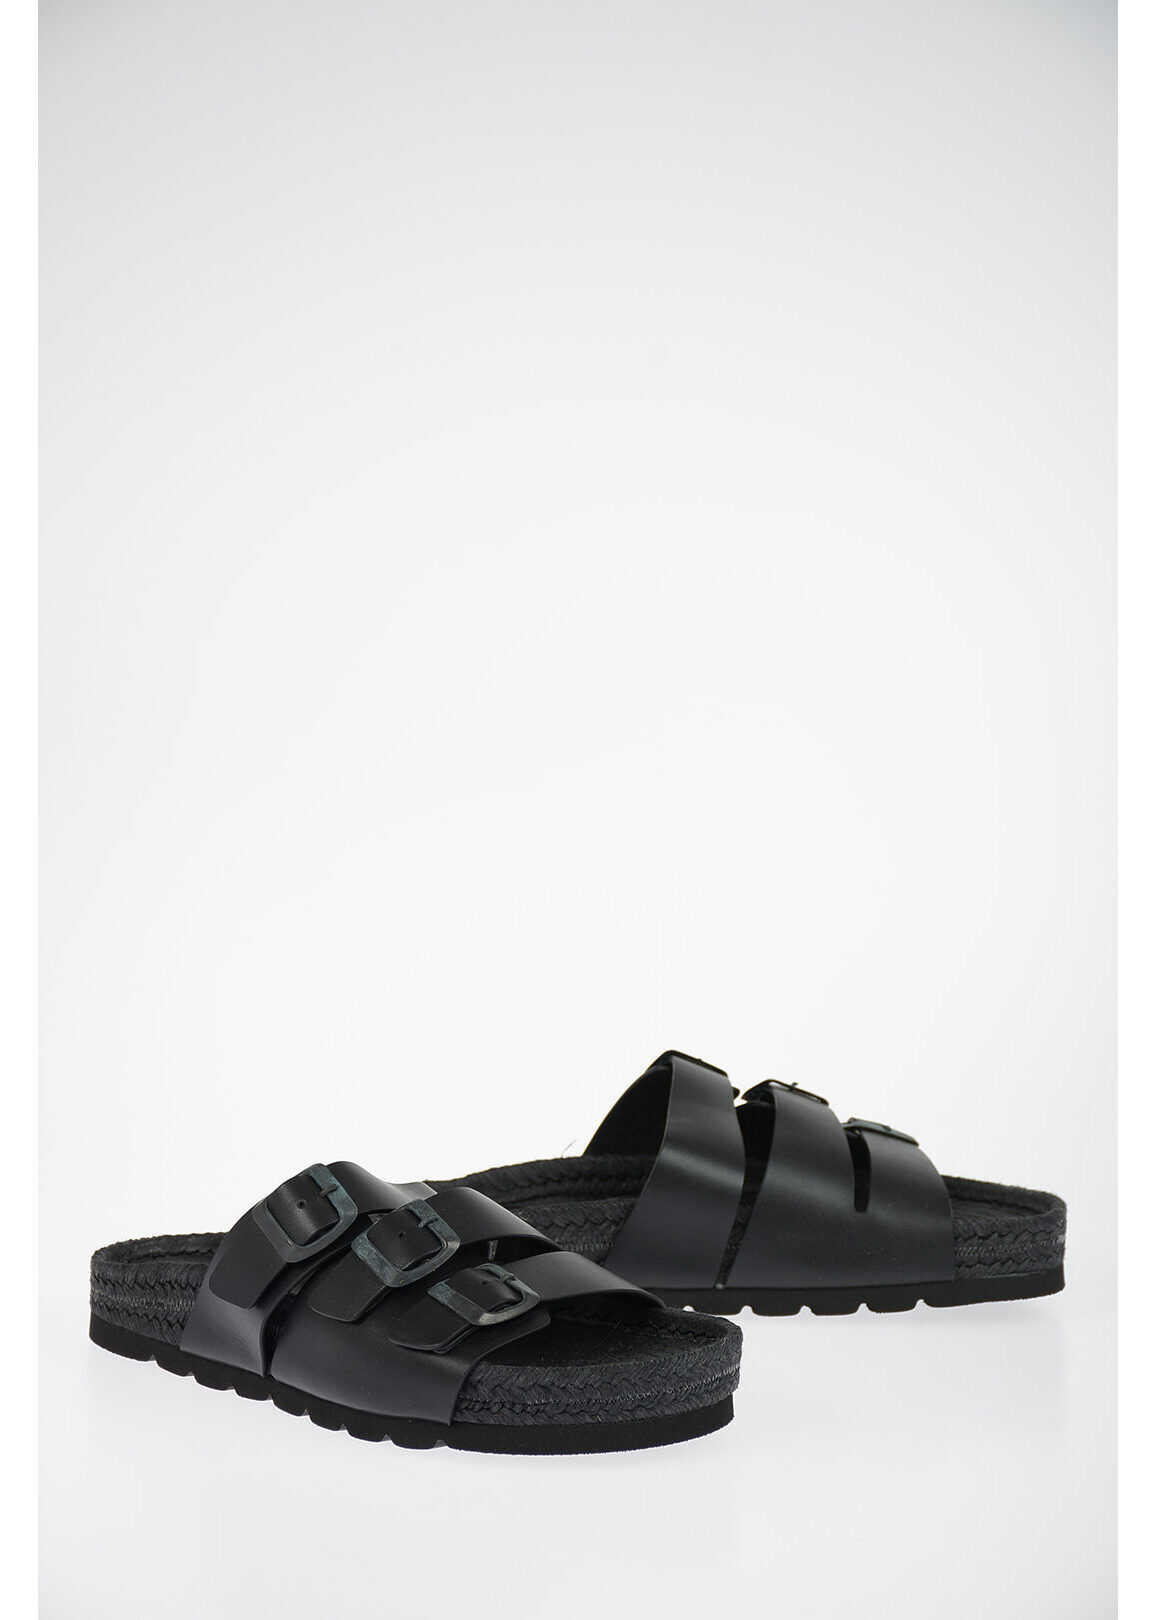 Neil Barrett Leather ESPADRILLE TRIPLE STRAP Slides BLACK